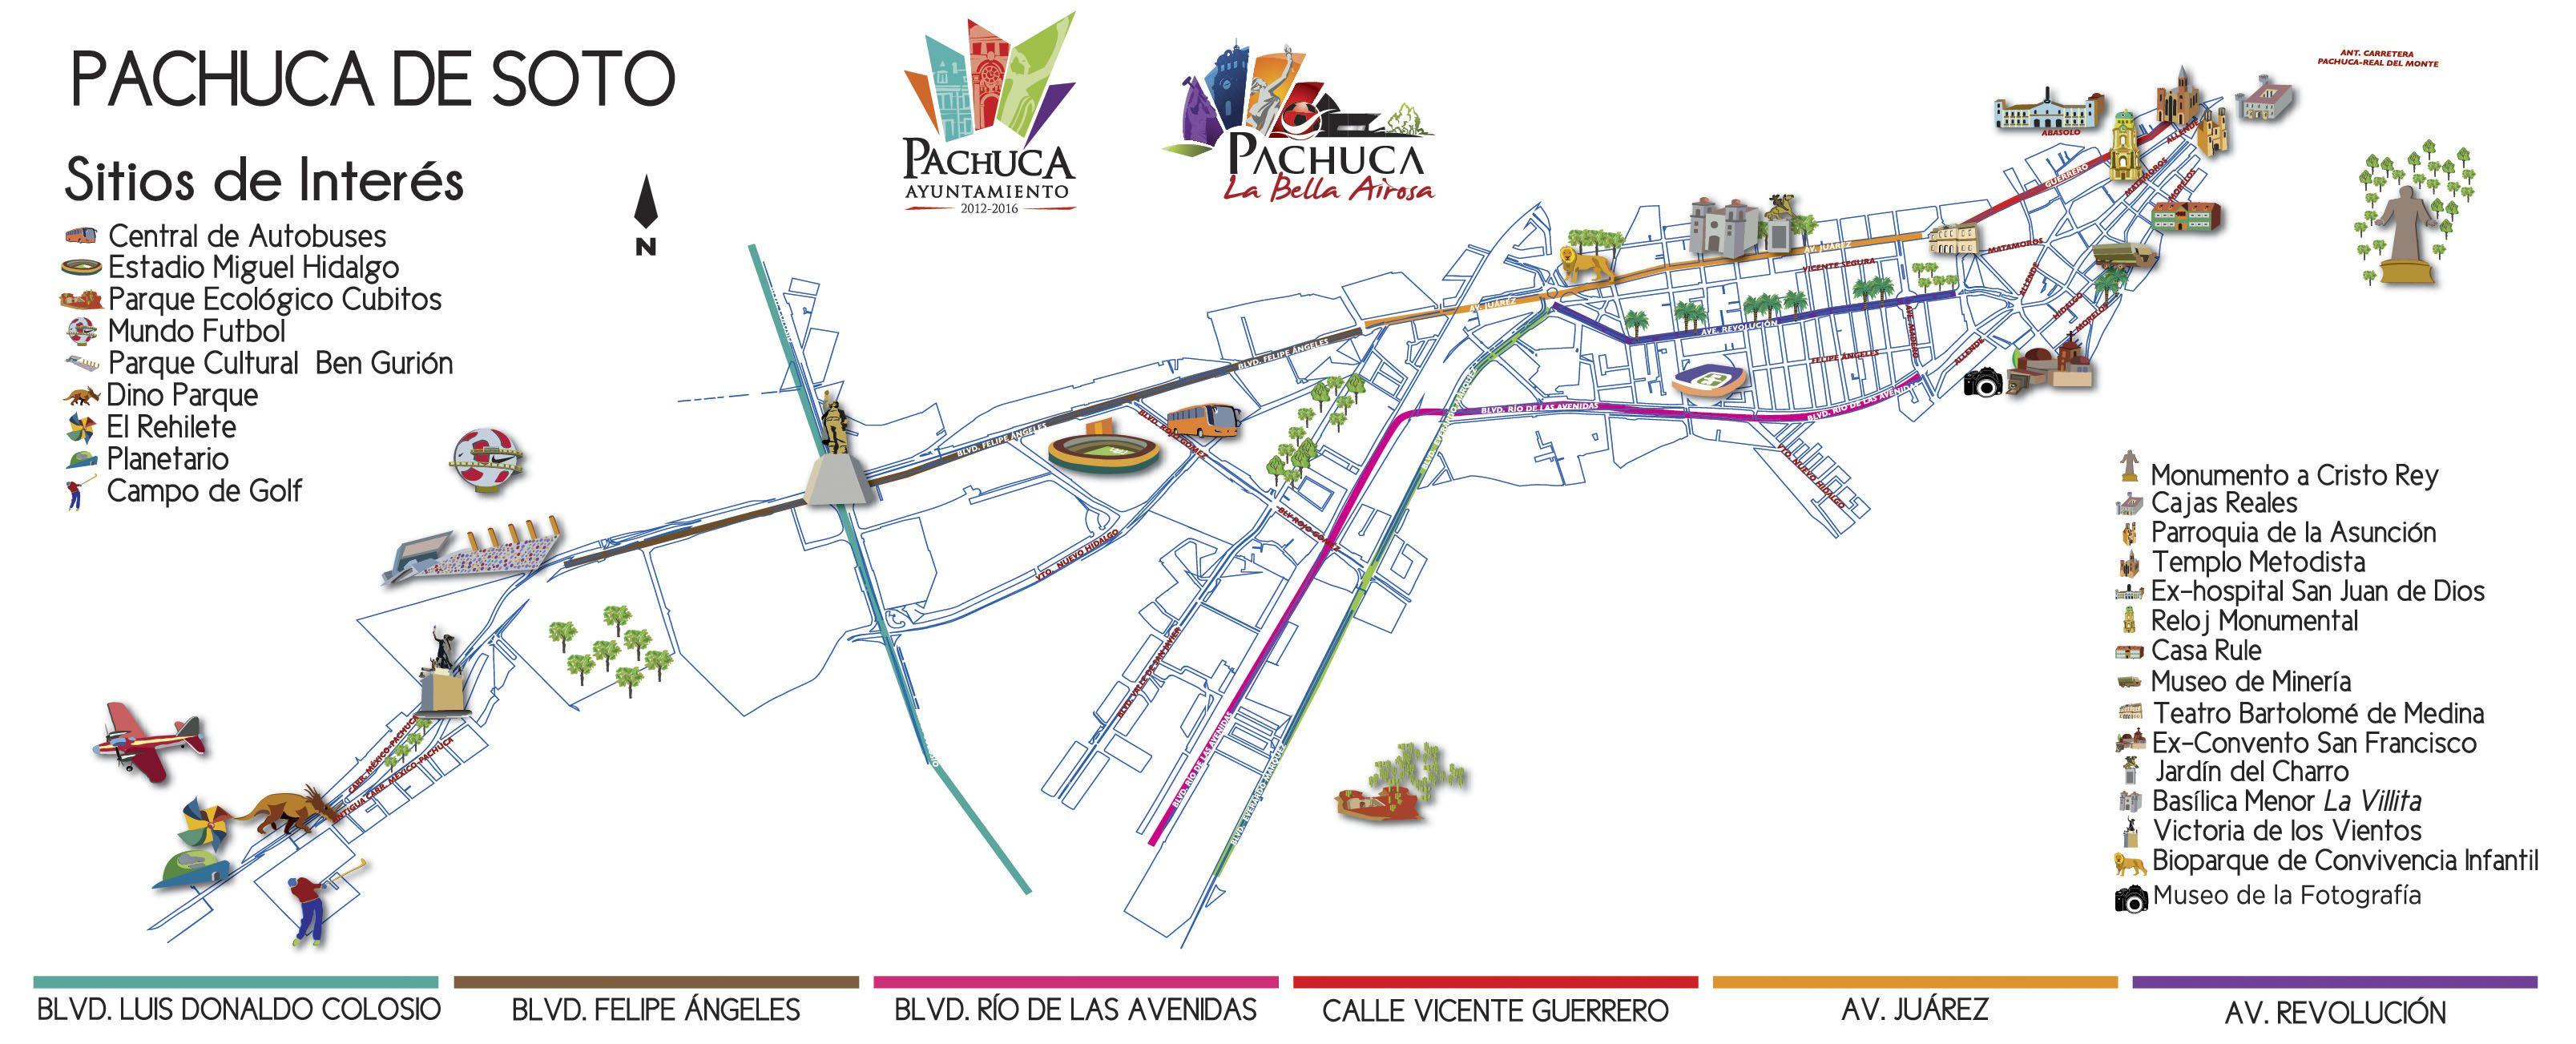 Mapa Turístico de Pachuca